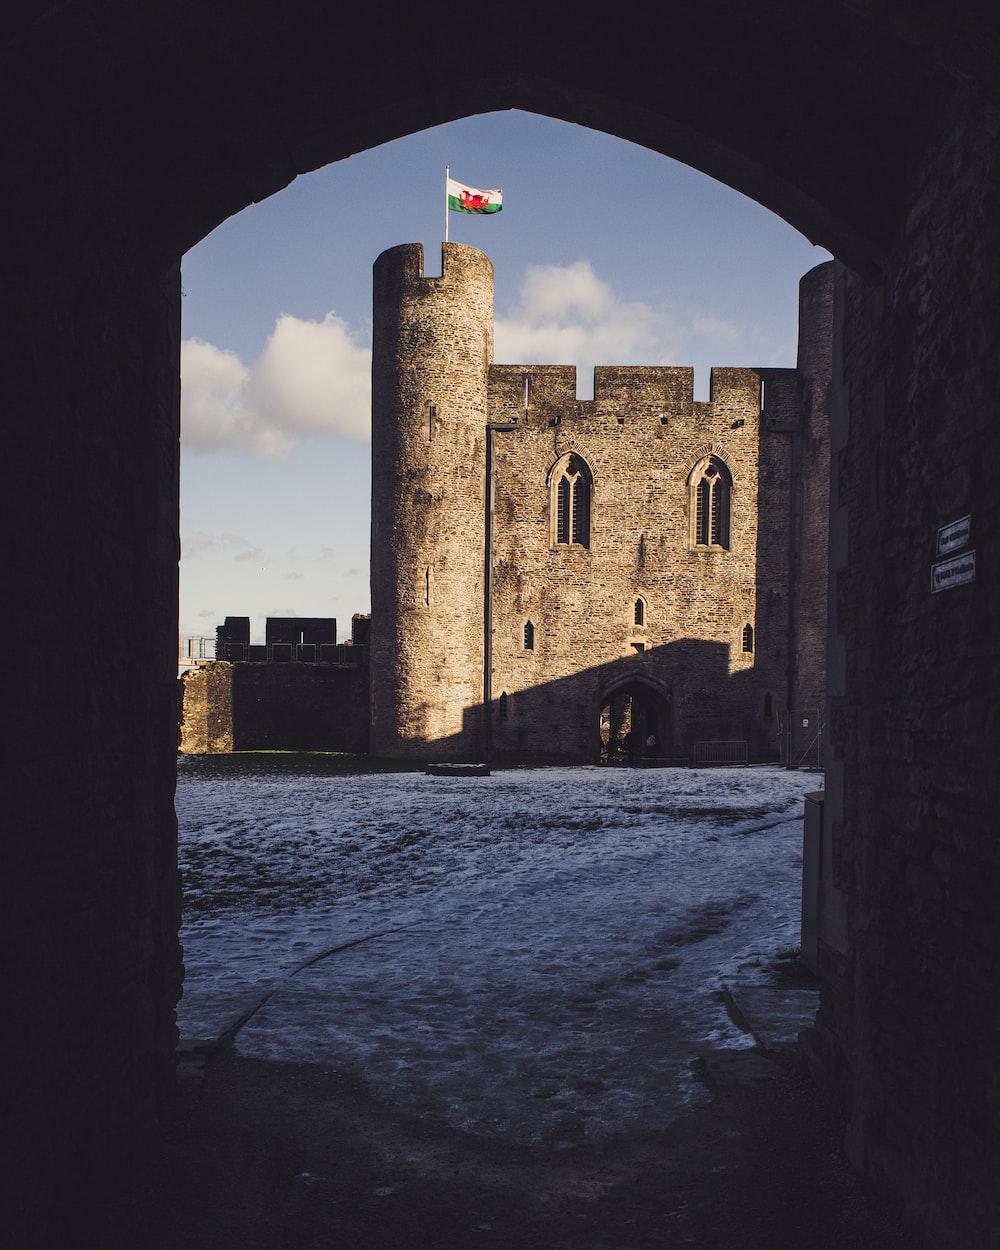 grey castle entrance